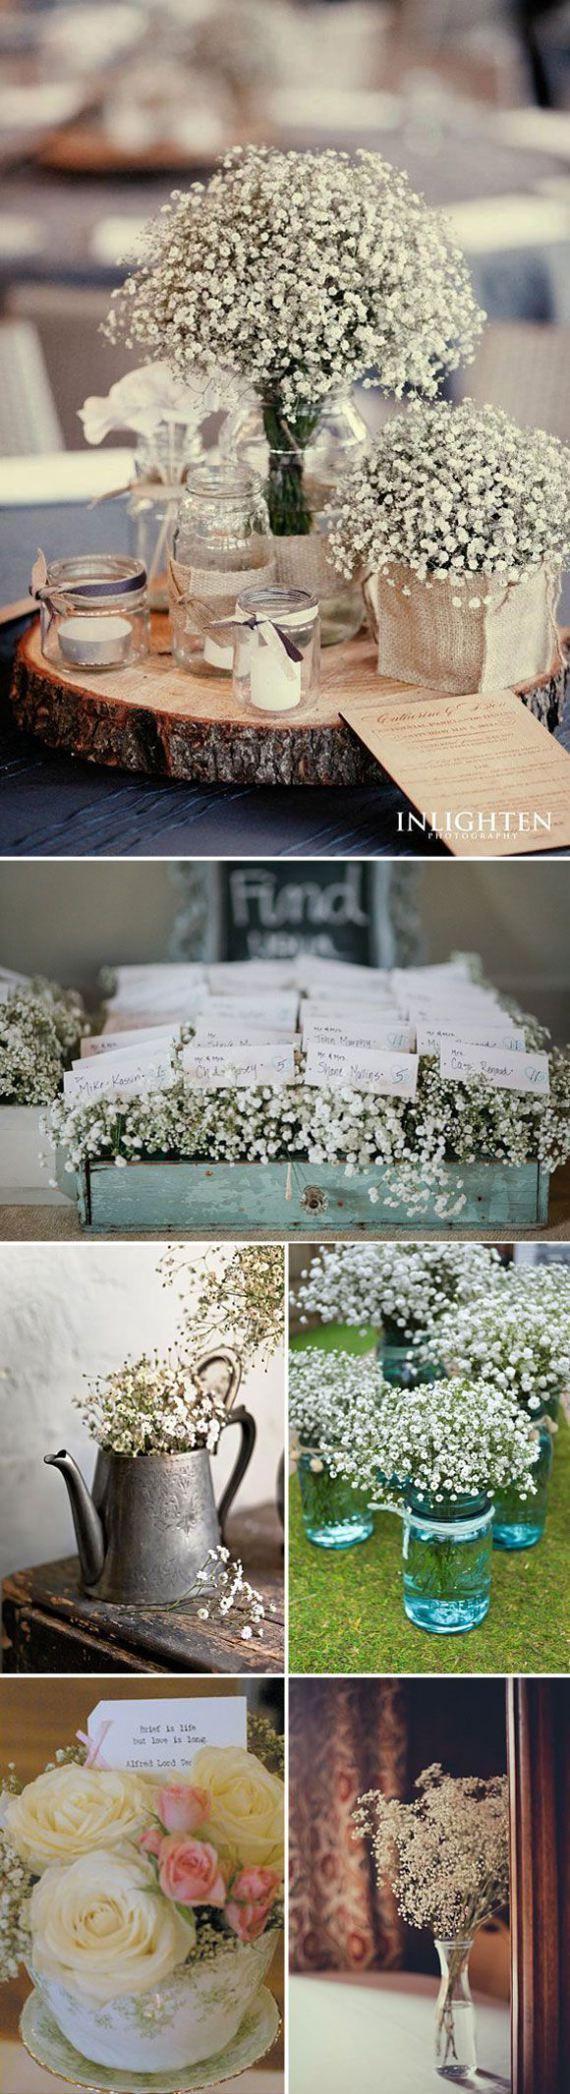 decor for the wedding. White color